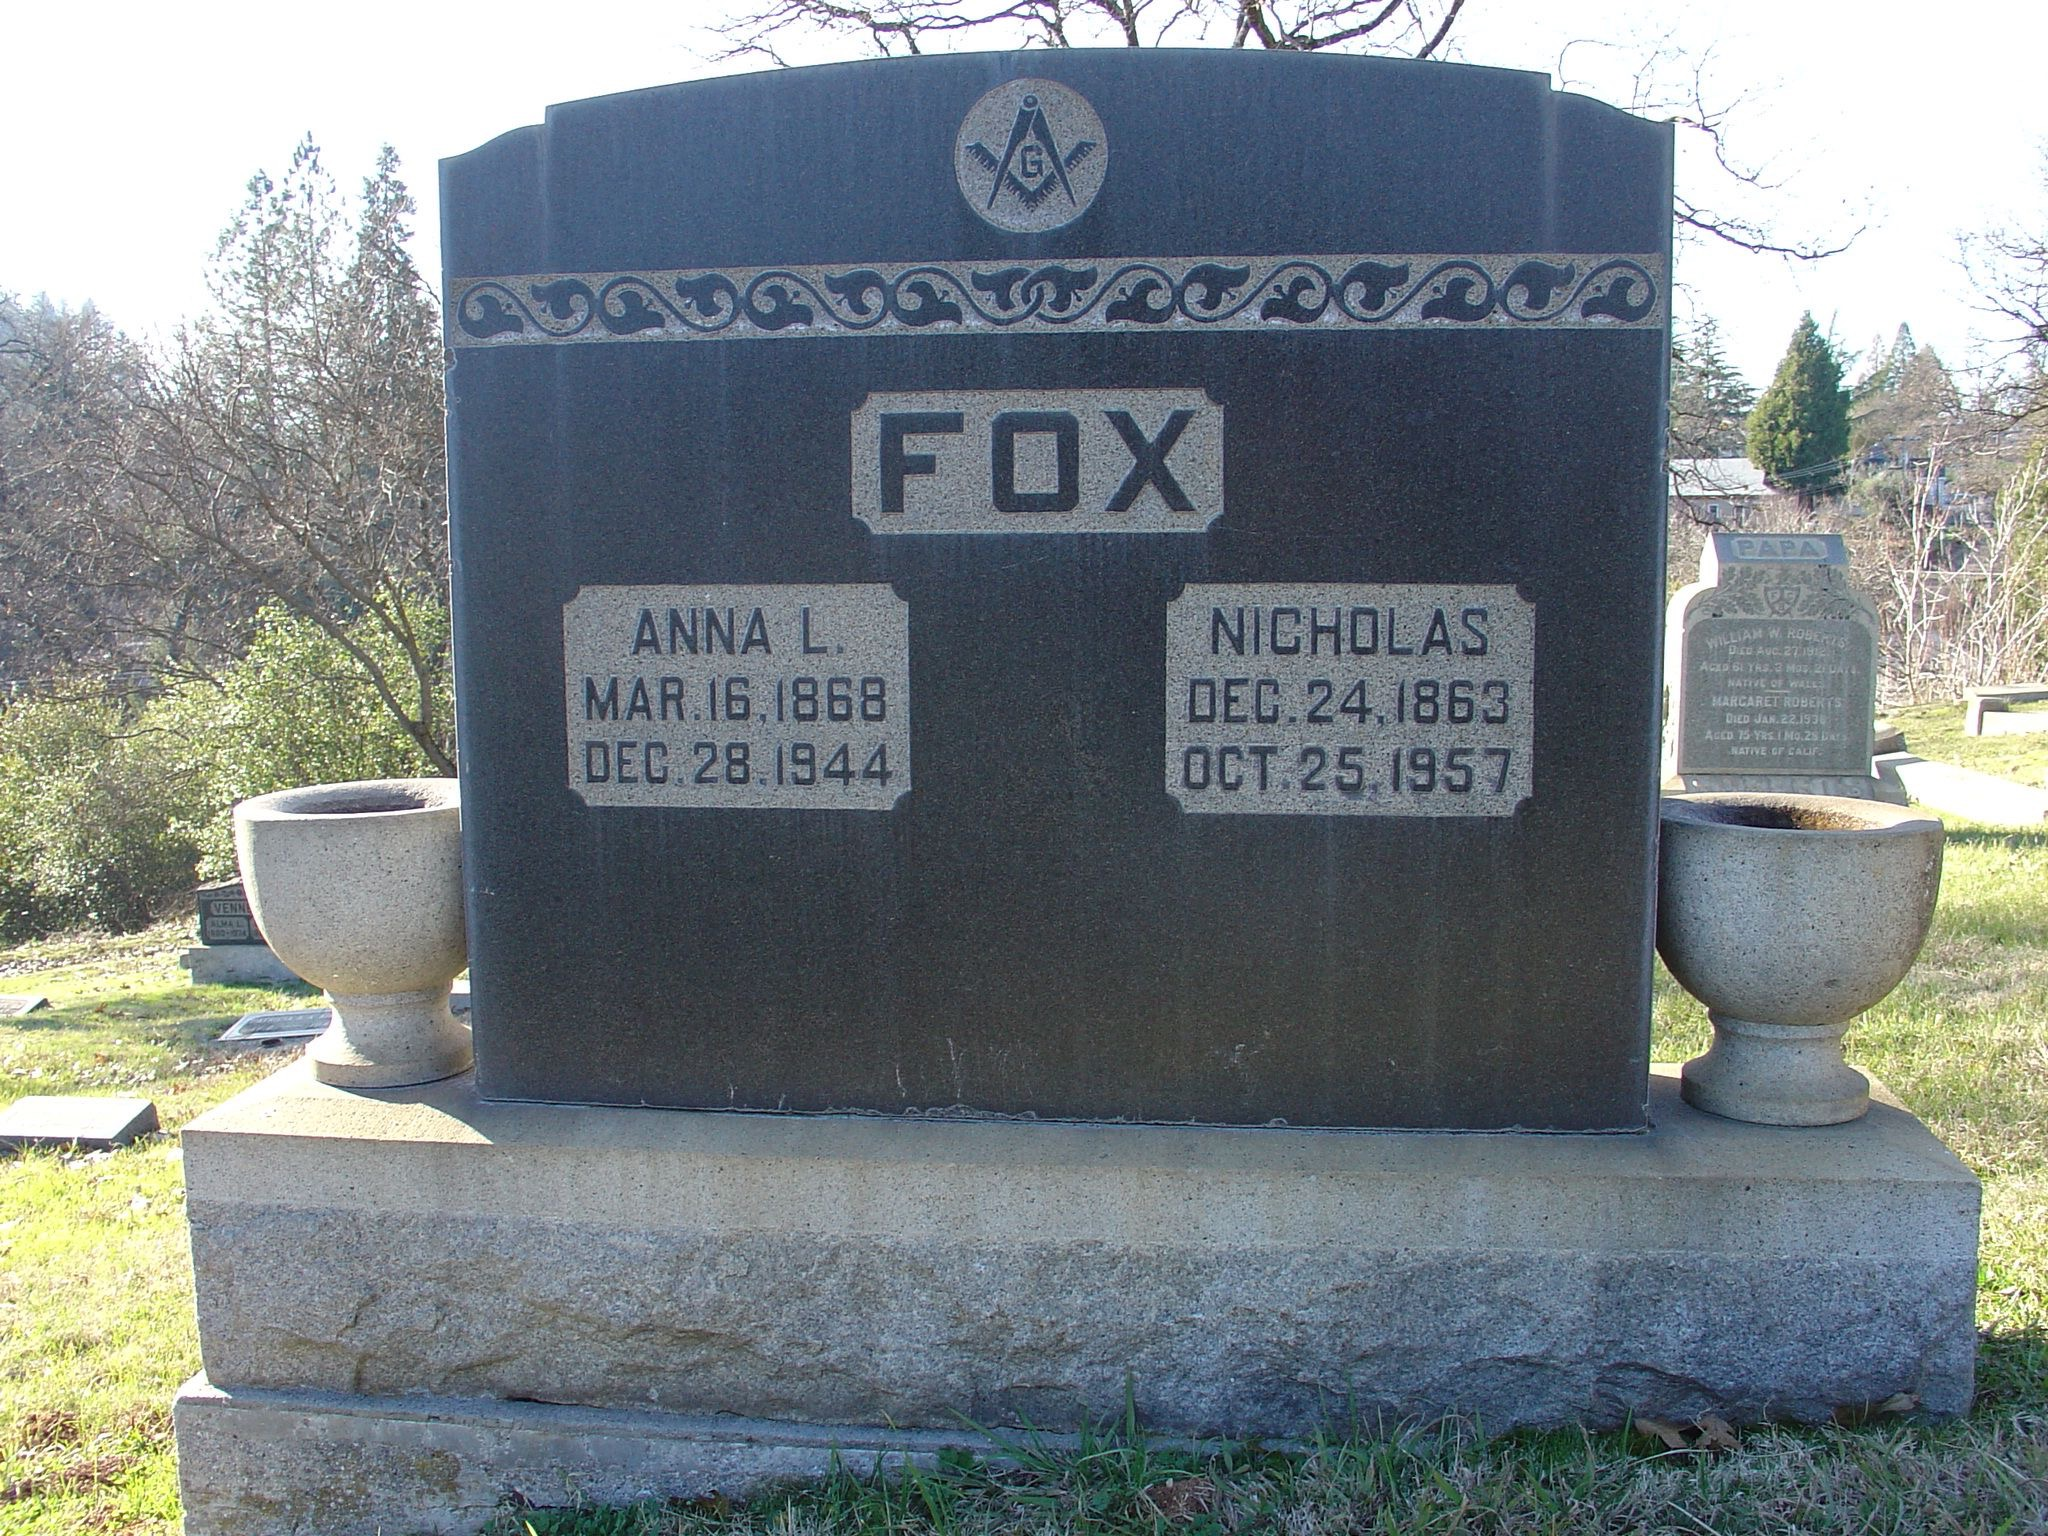 Fox headstone